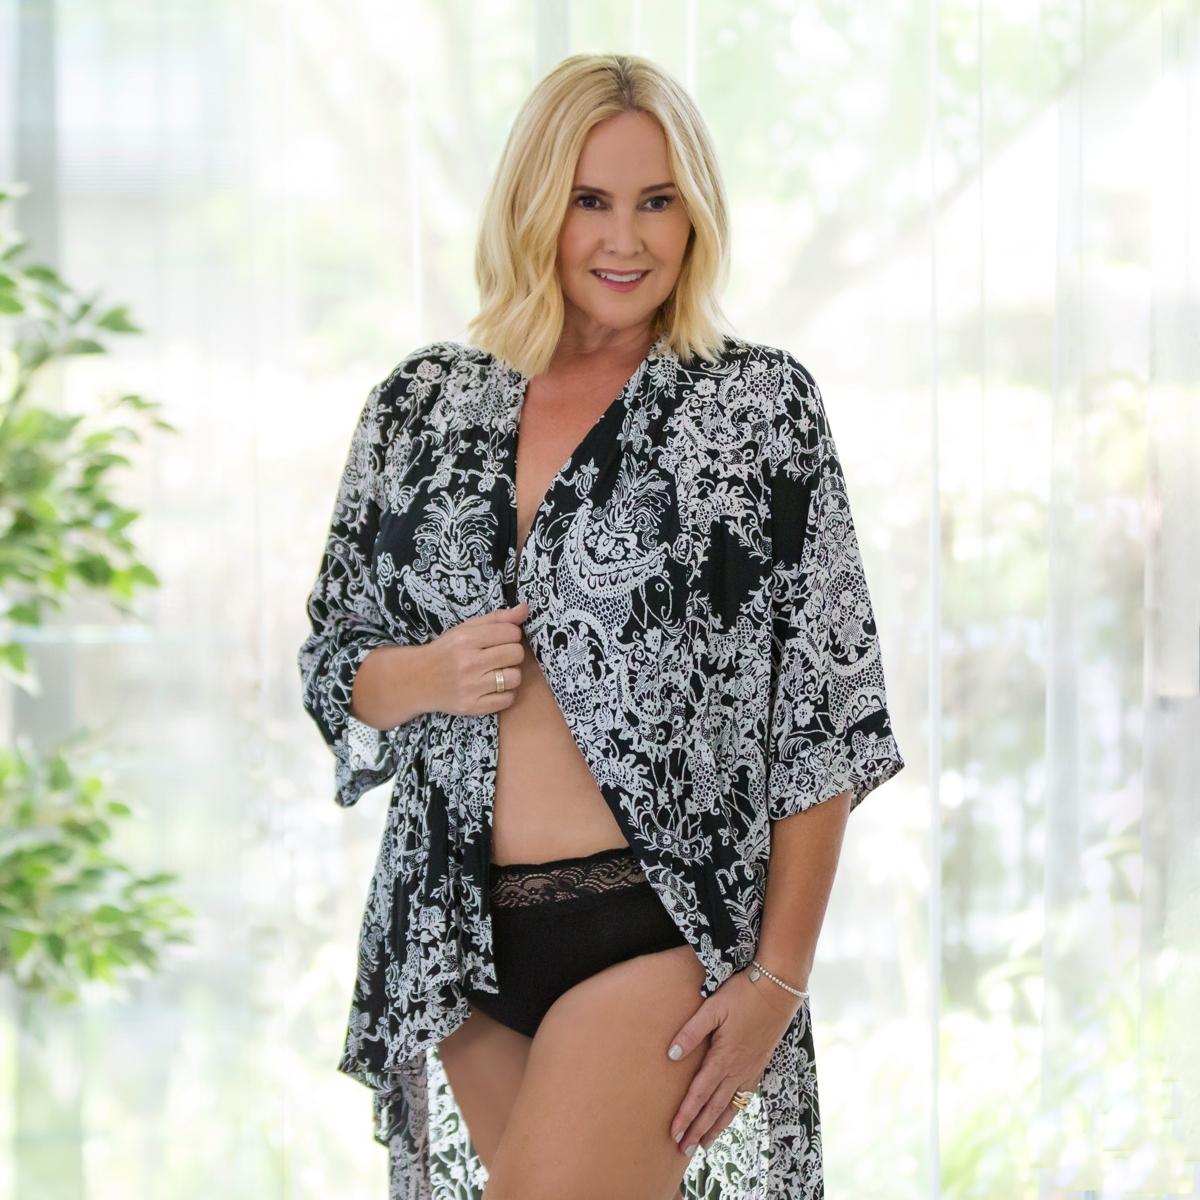 Modibodi sensual high-waist bikini - heavy/overnight absorbency | Styling You